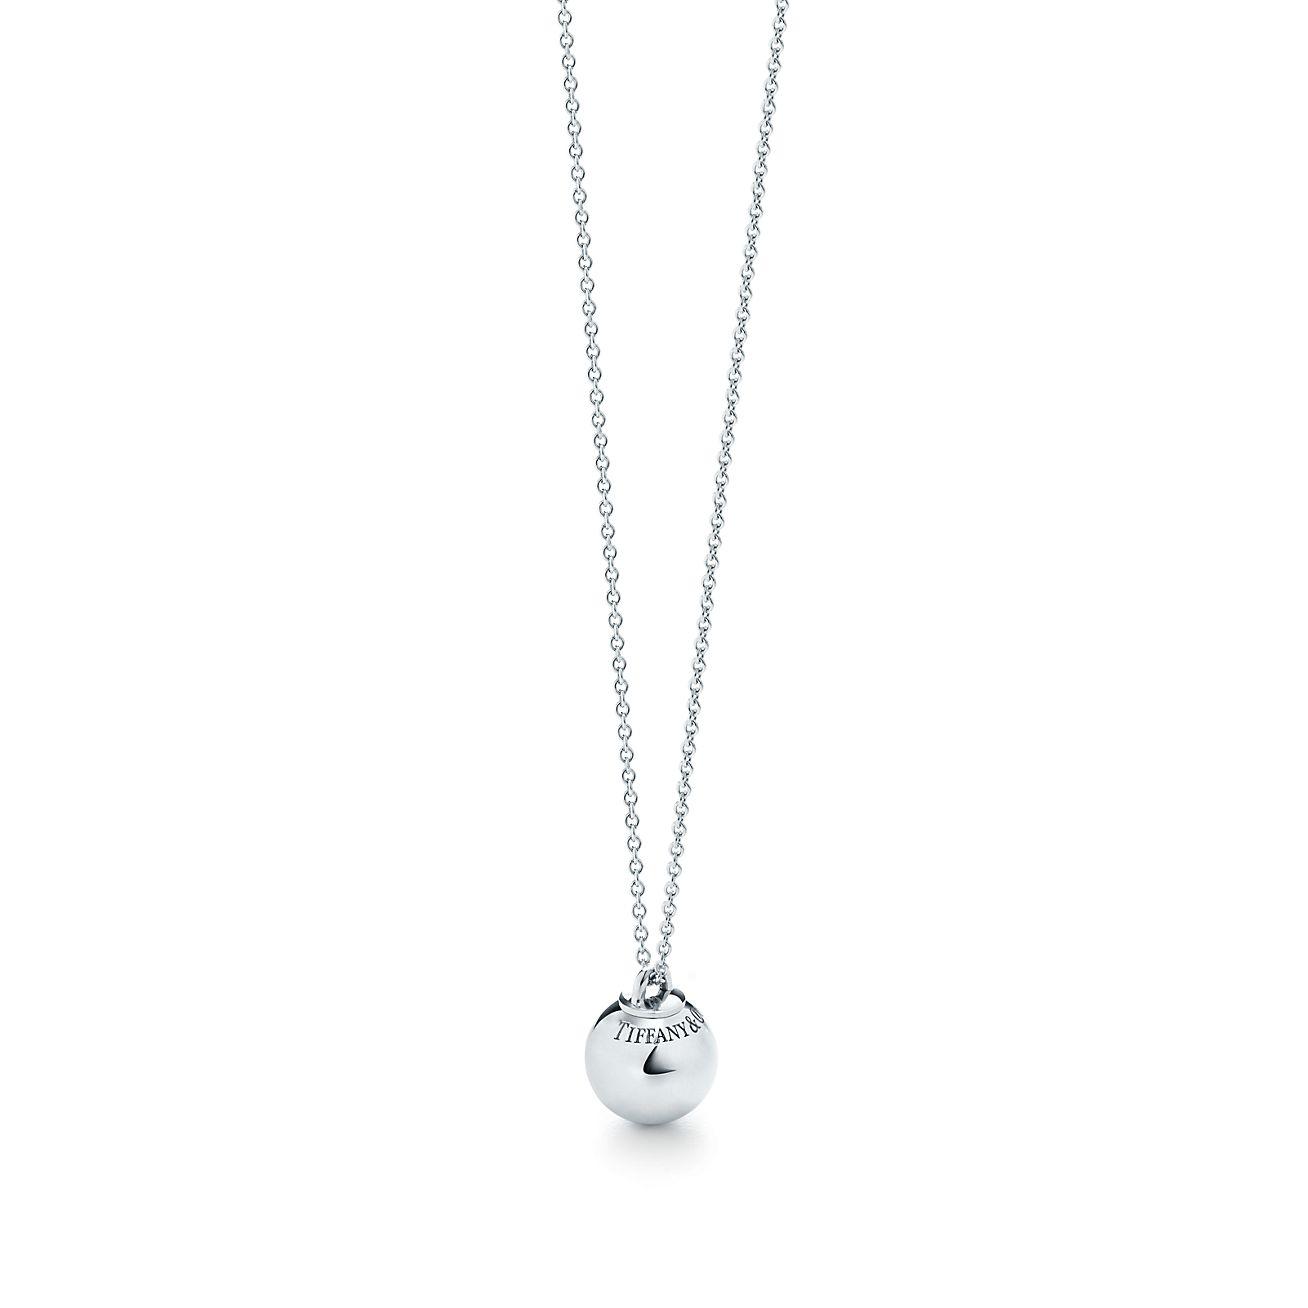 Shop tiffany hardwear sterling silver ball pendant tiffany co tiffany hardwearball pendant audiocablefo light Images